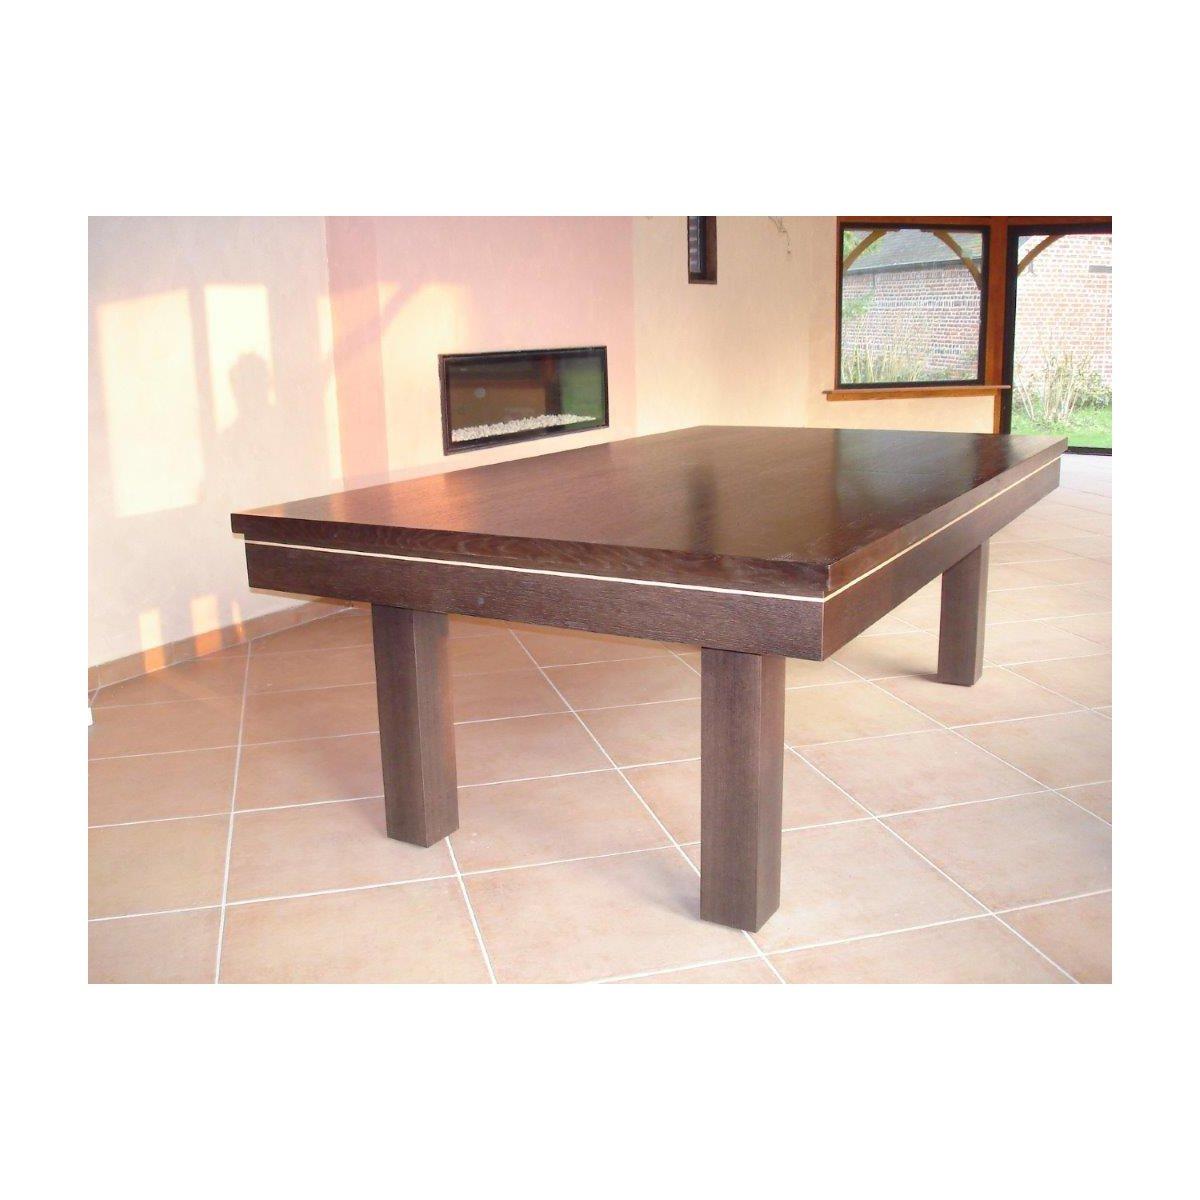 Table De Ping Pong Transformable billard transformable table : soho -